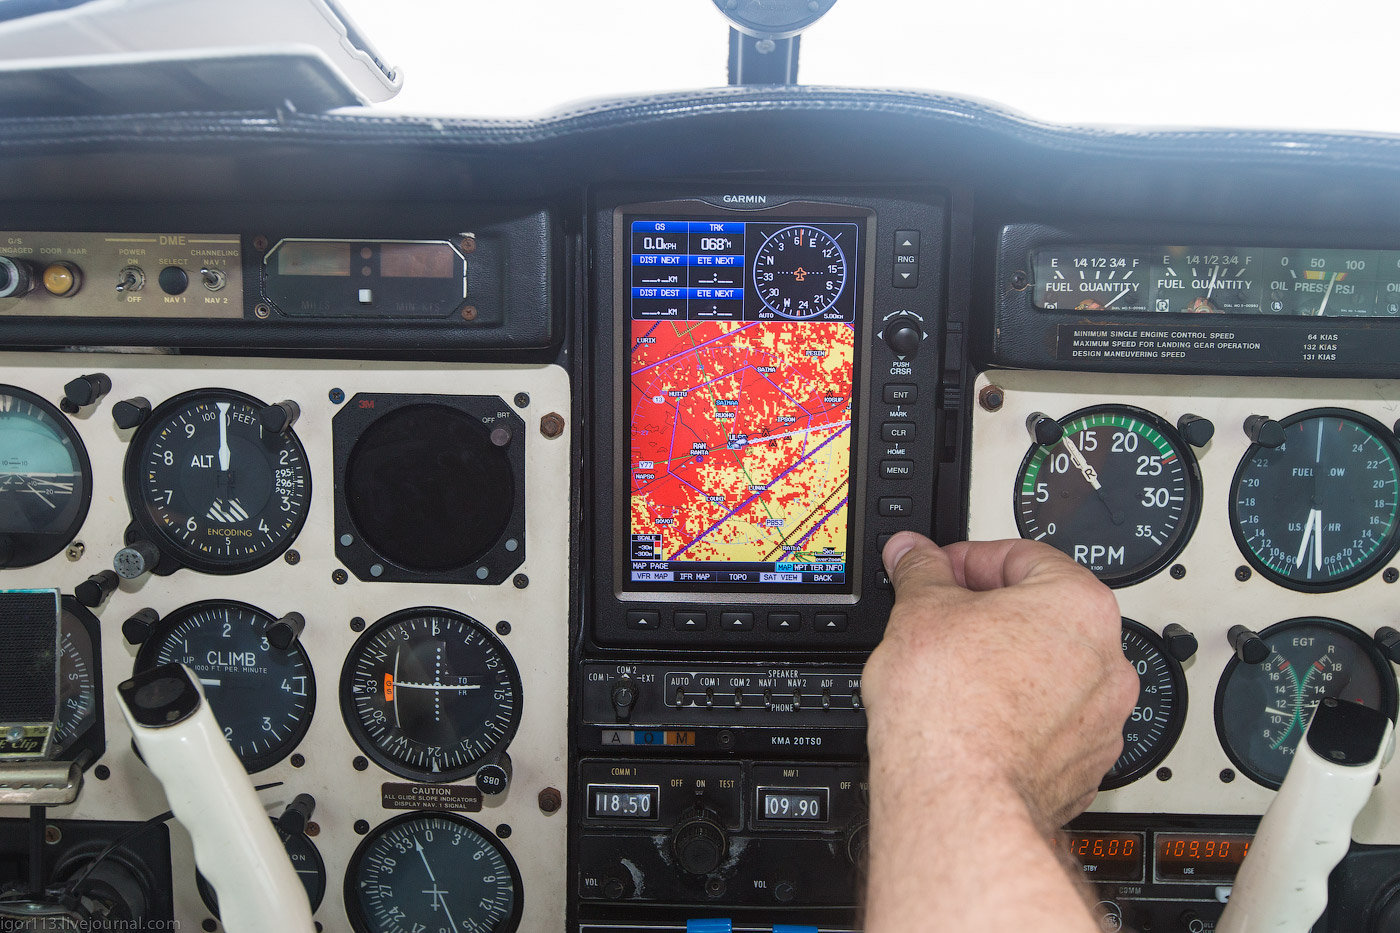 gps навигатор pioneer pa-420 инструкция